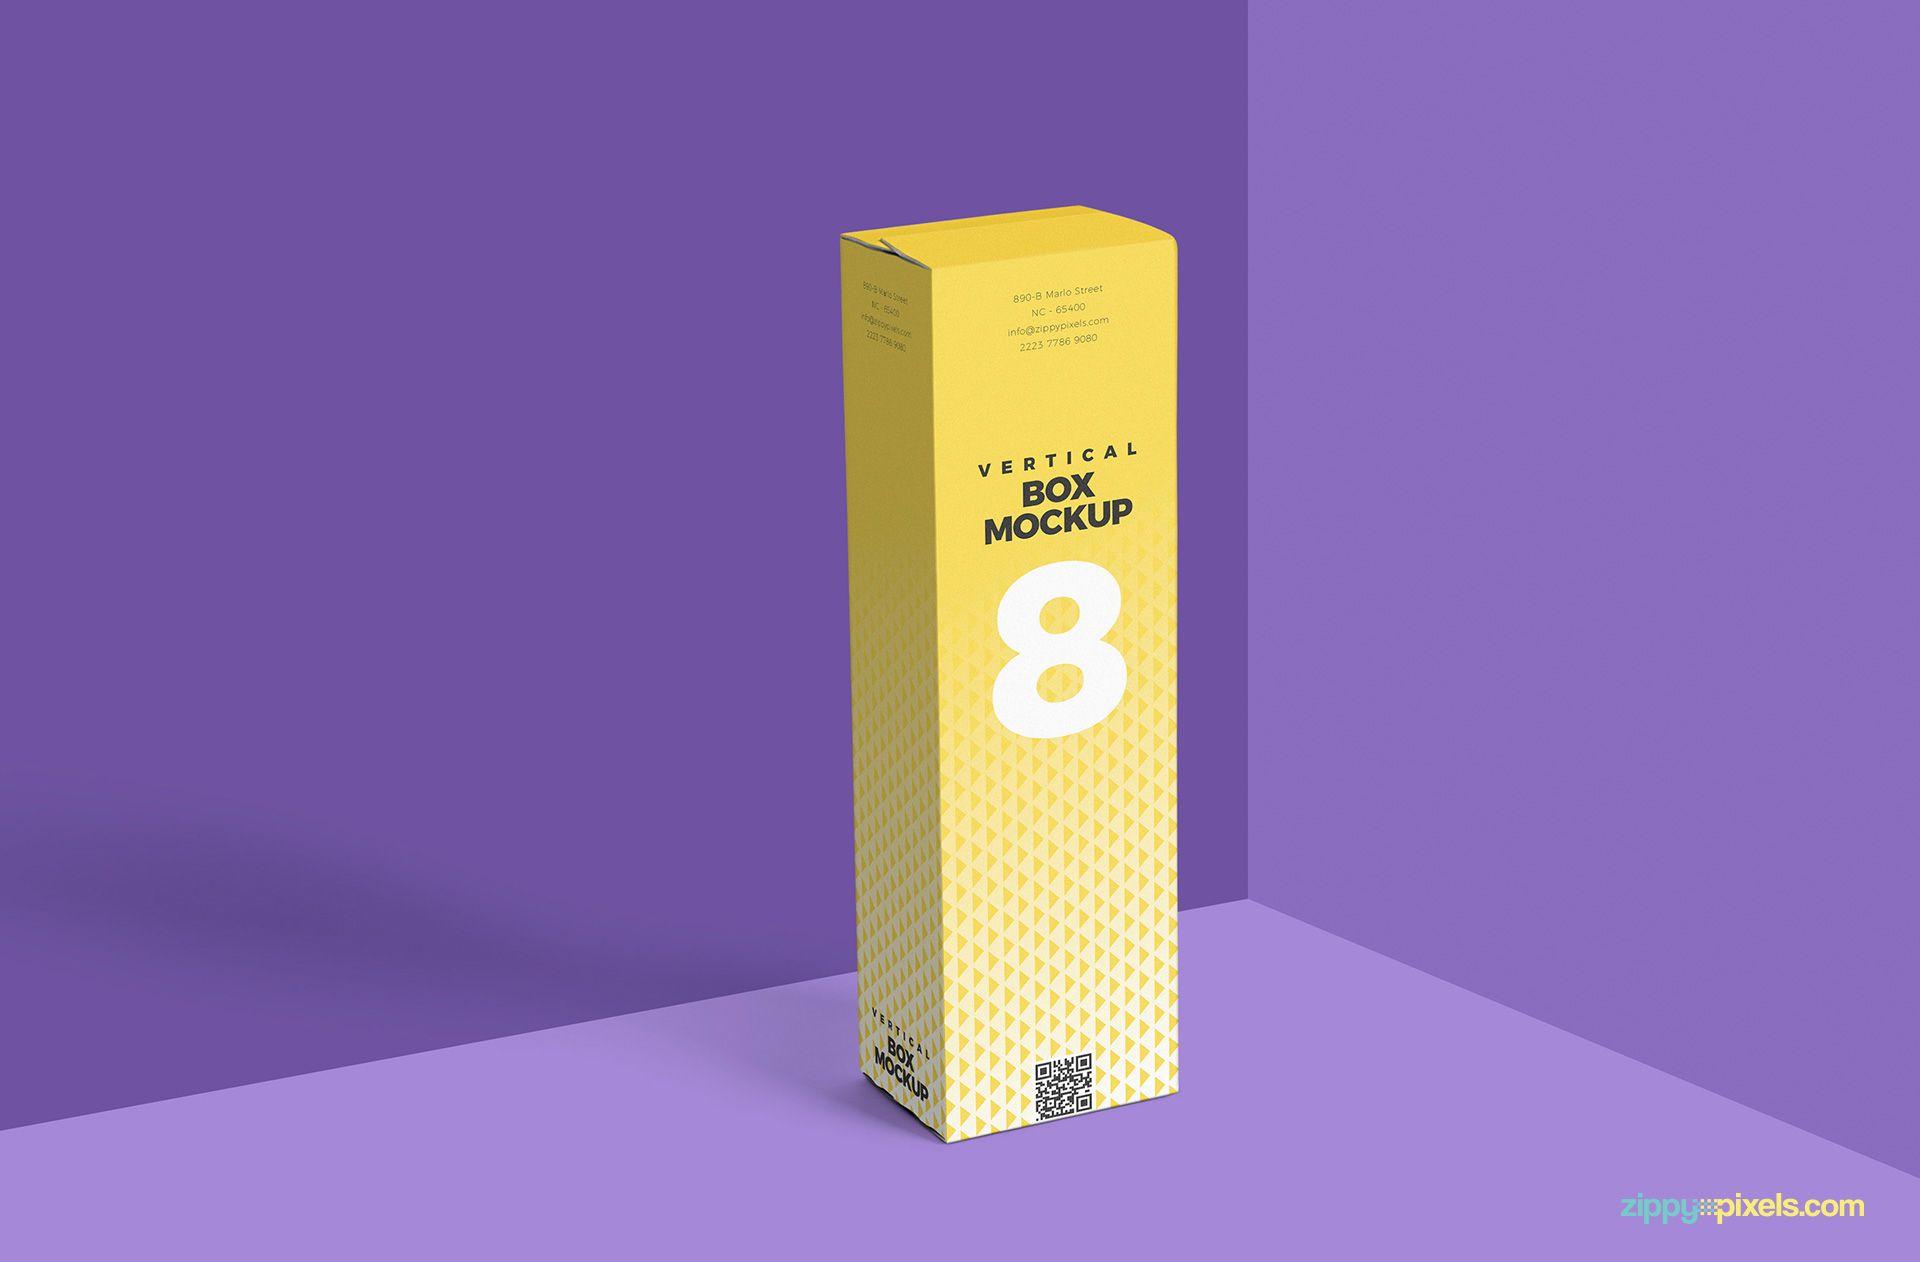 Download Free Vertical Box Mockup For Cardboard Zippypixels Box Mockup Packaging Mockup Free Packaging Mockup